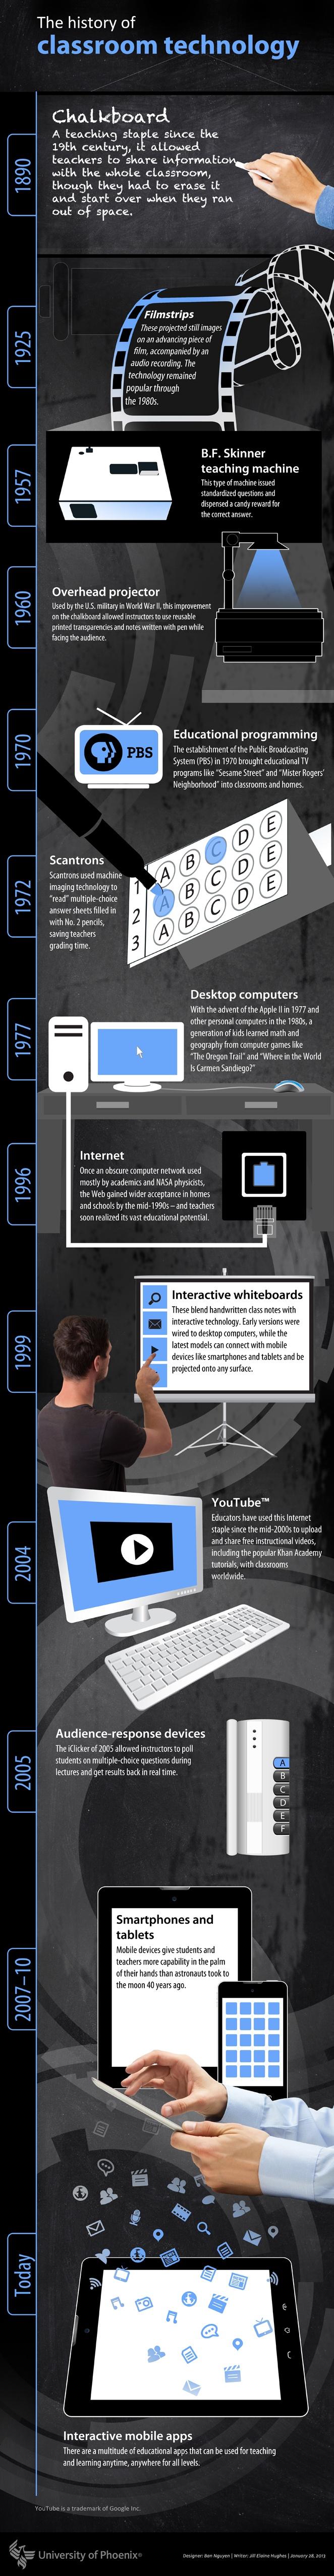 Classroom-Technology-Evolution-Infographic